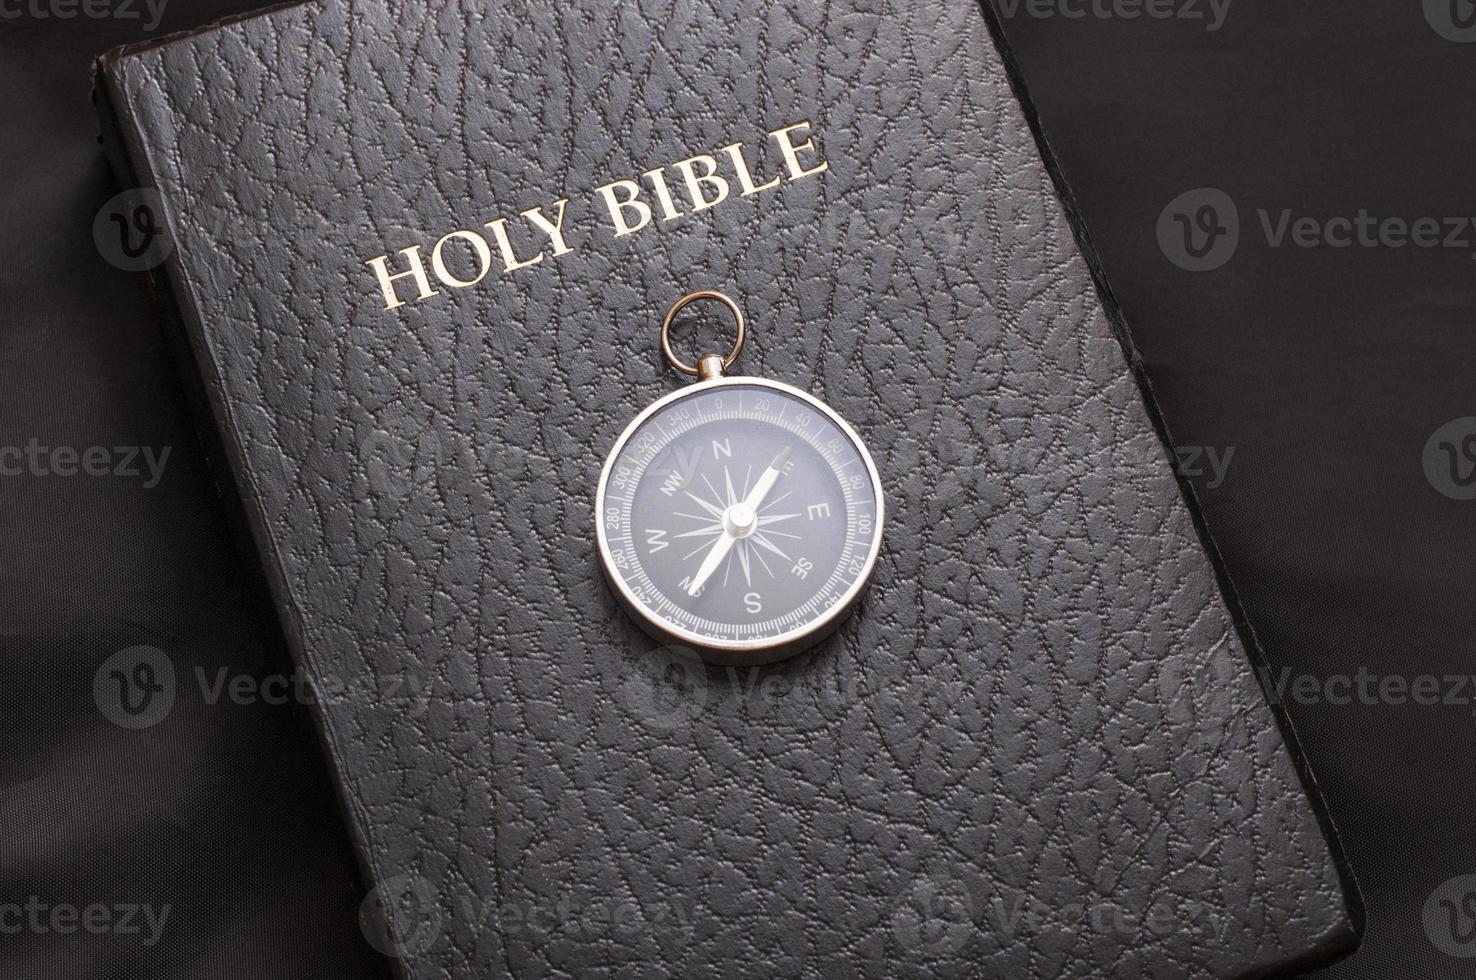 Sagrada Biblia foto